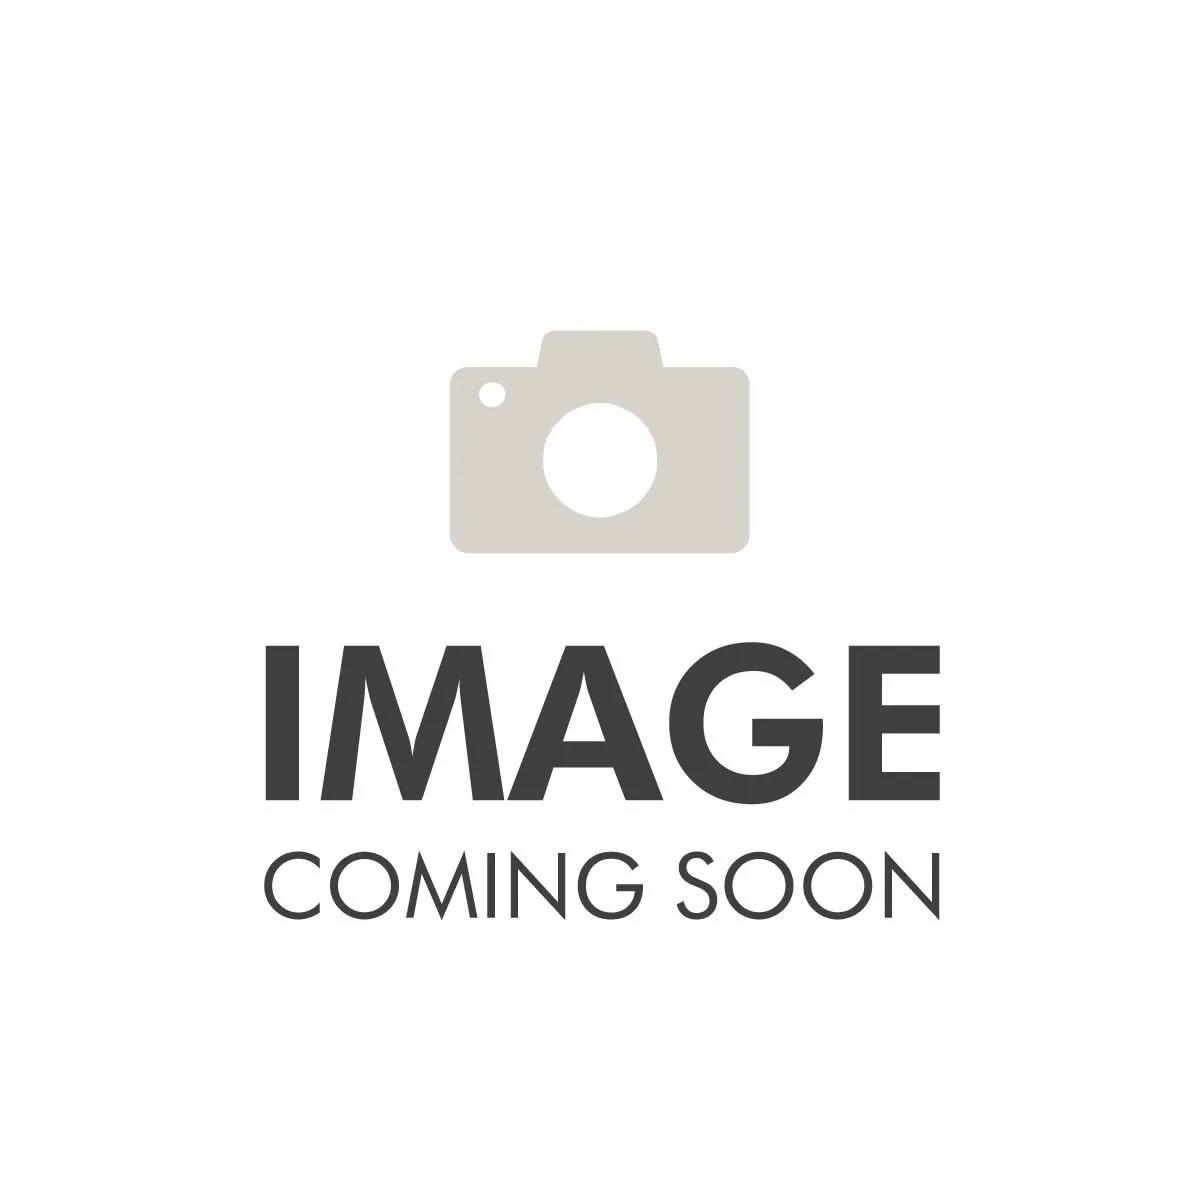 Spartan Grille Kit, Skull, 07-18 Jeep Wrangler